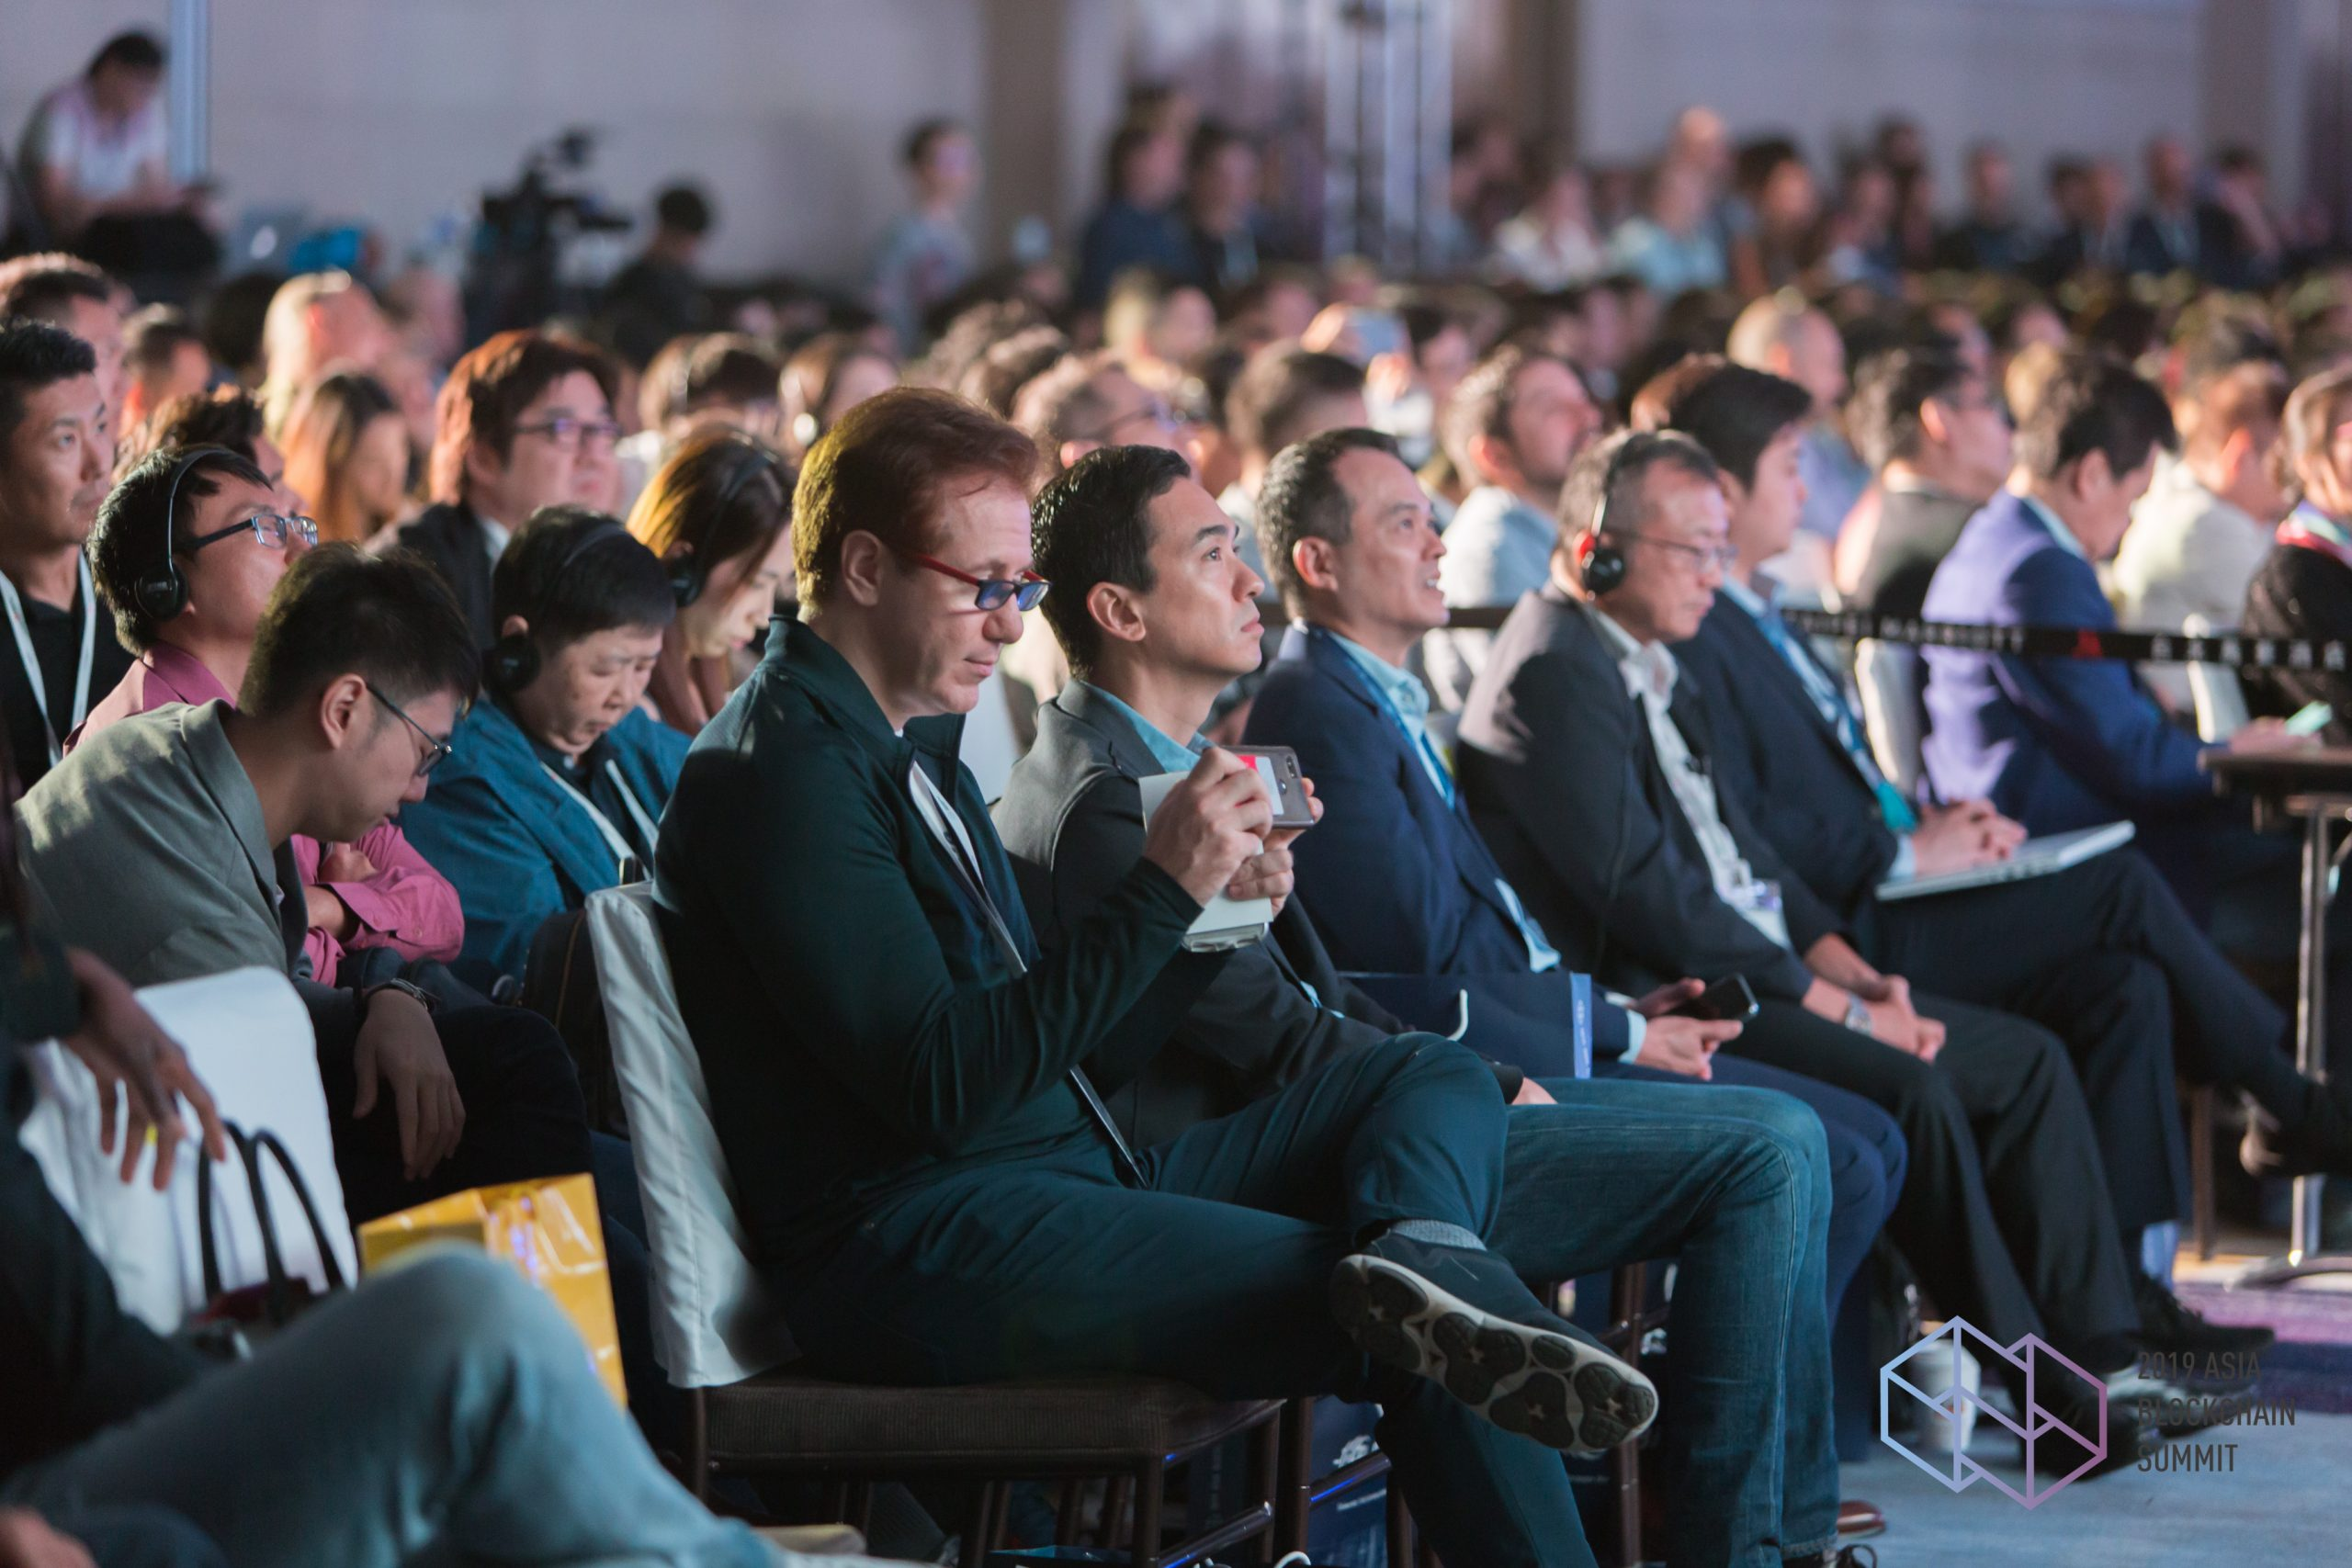 web-summit-2018-night-summit-tuesday-4